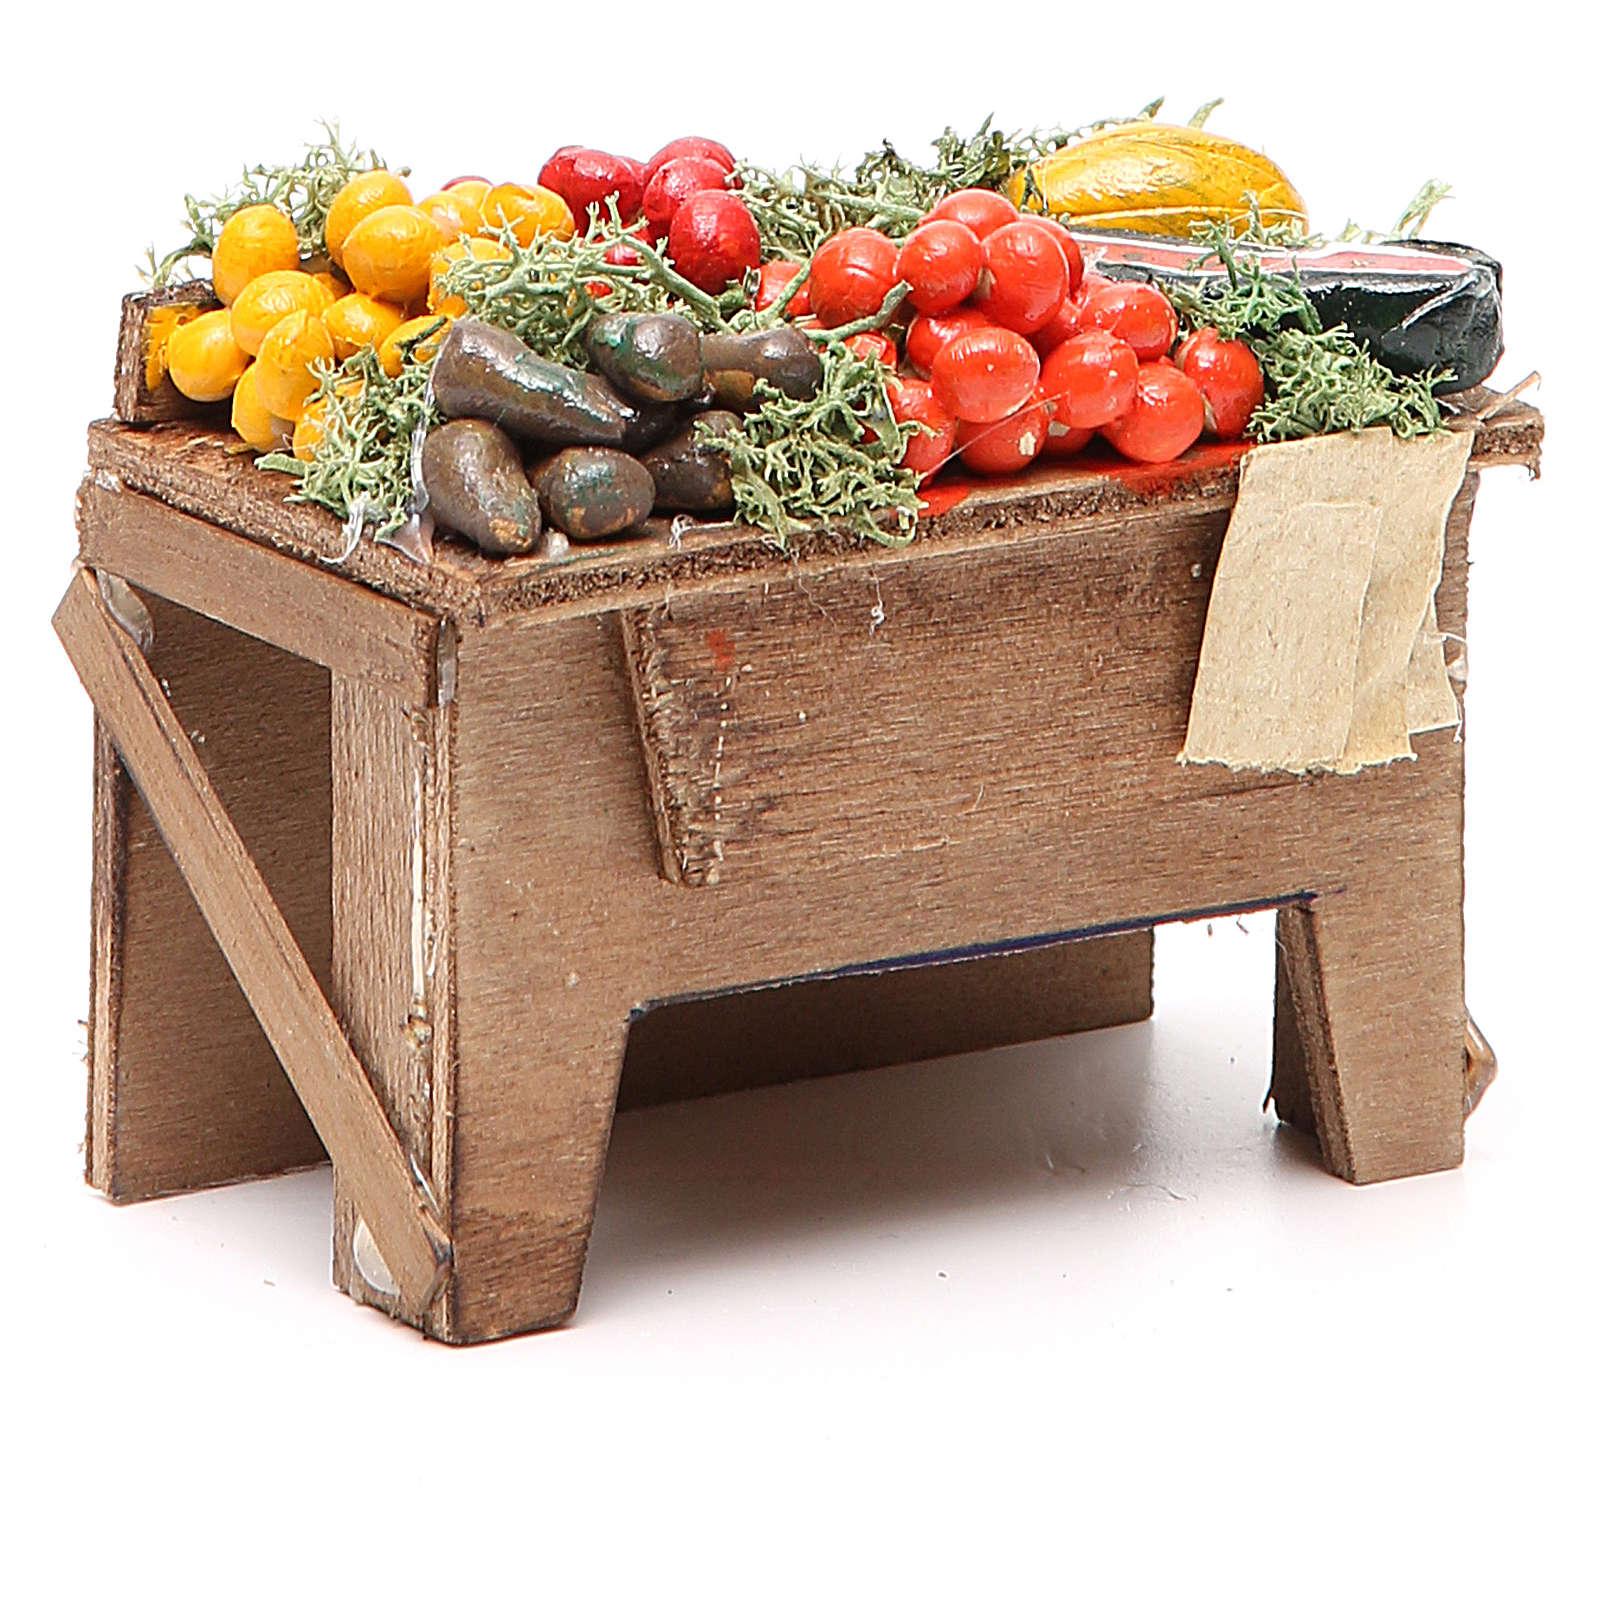 Tavola con verdure 8x9x7 cm presepe Napoli 4